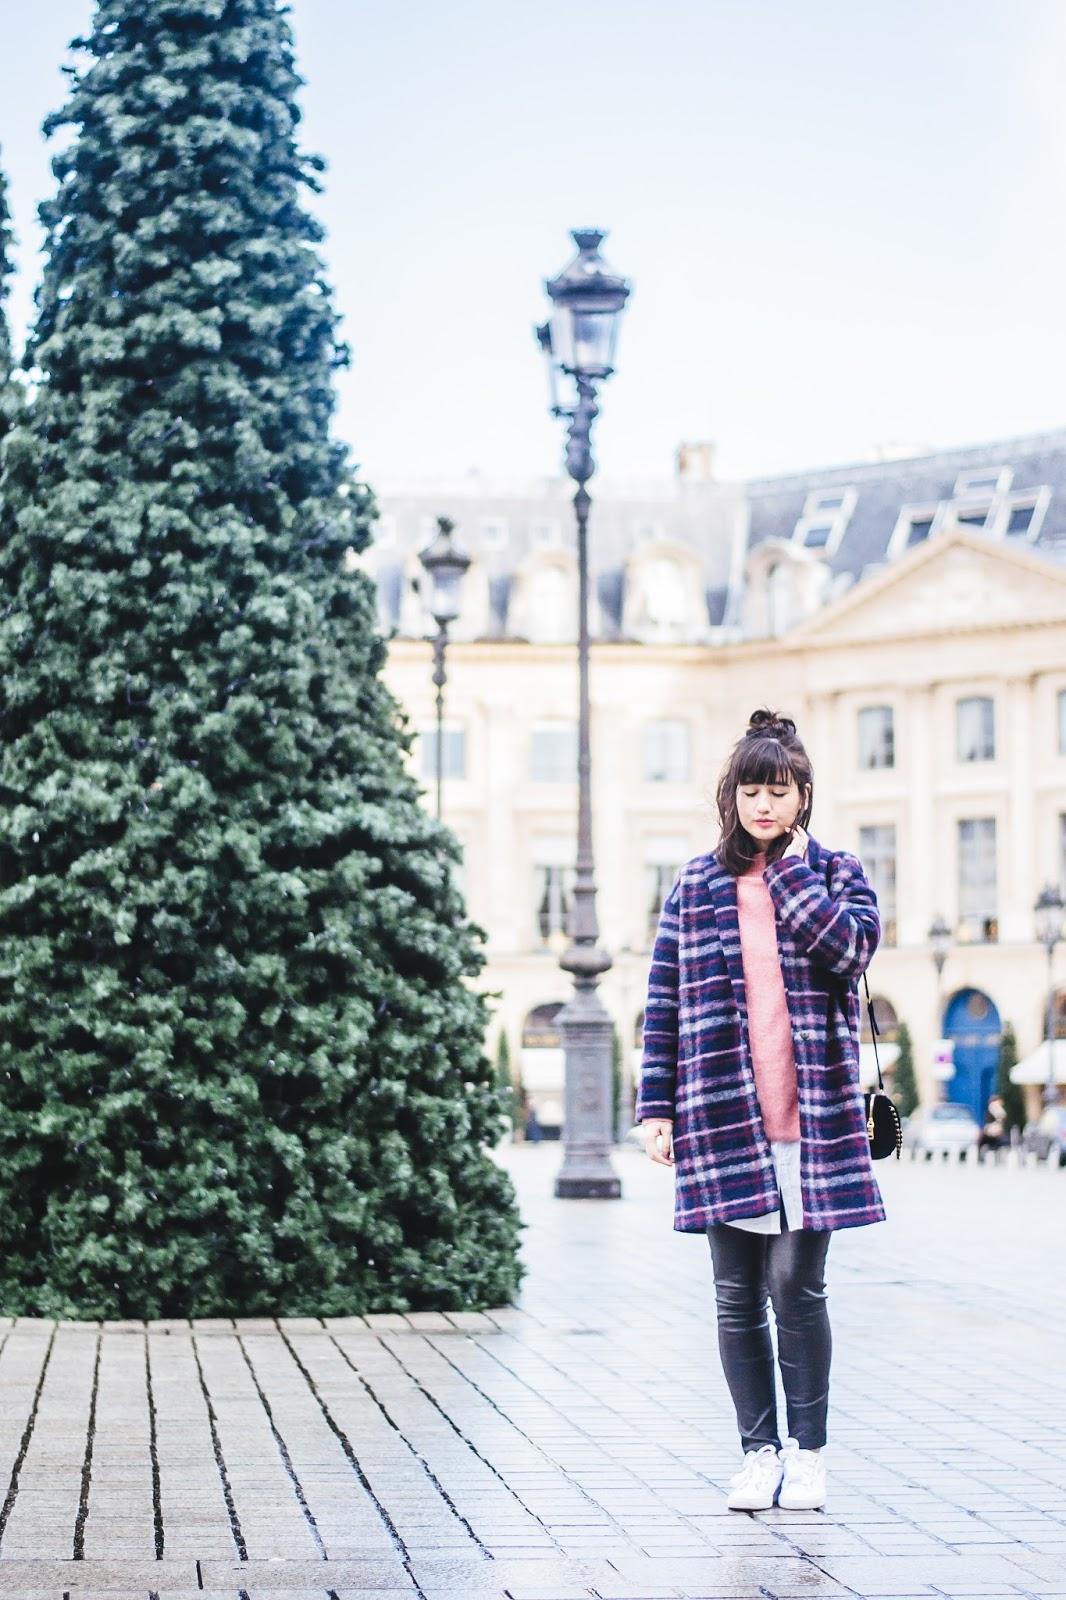 meetmeinparee-style-look-mode-fashion-paris-parisianblogger